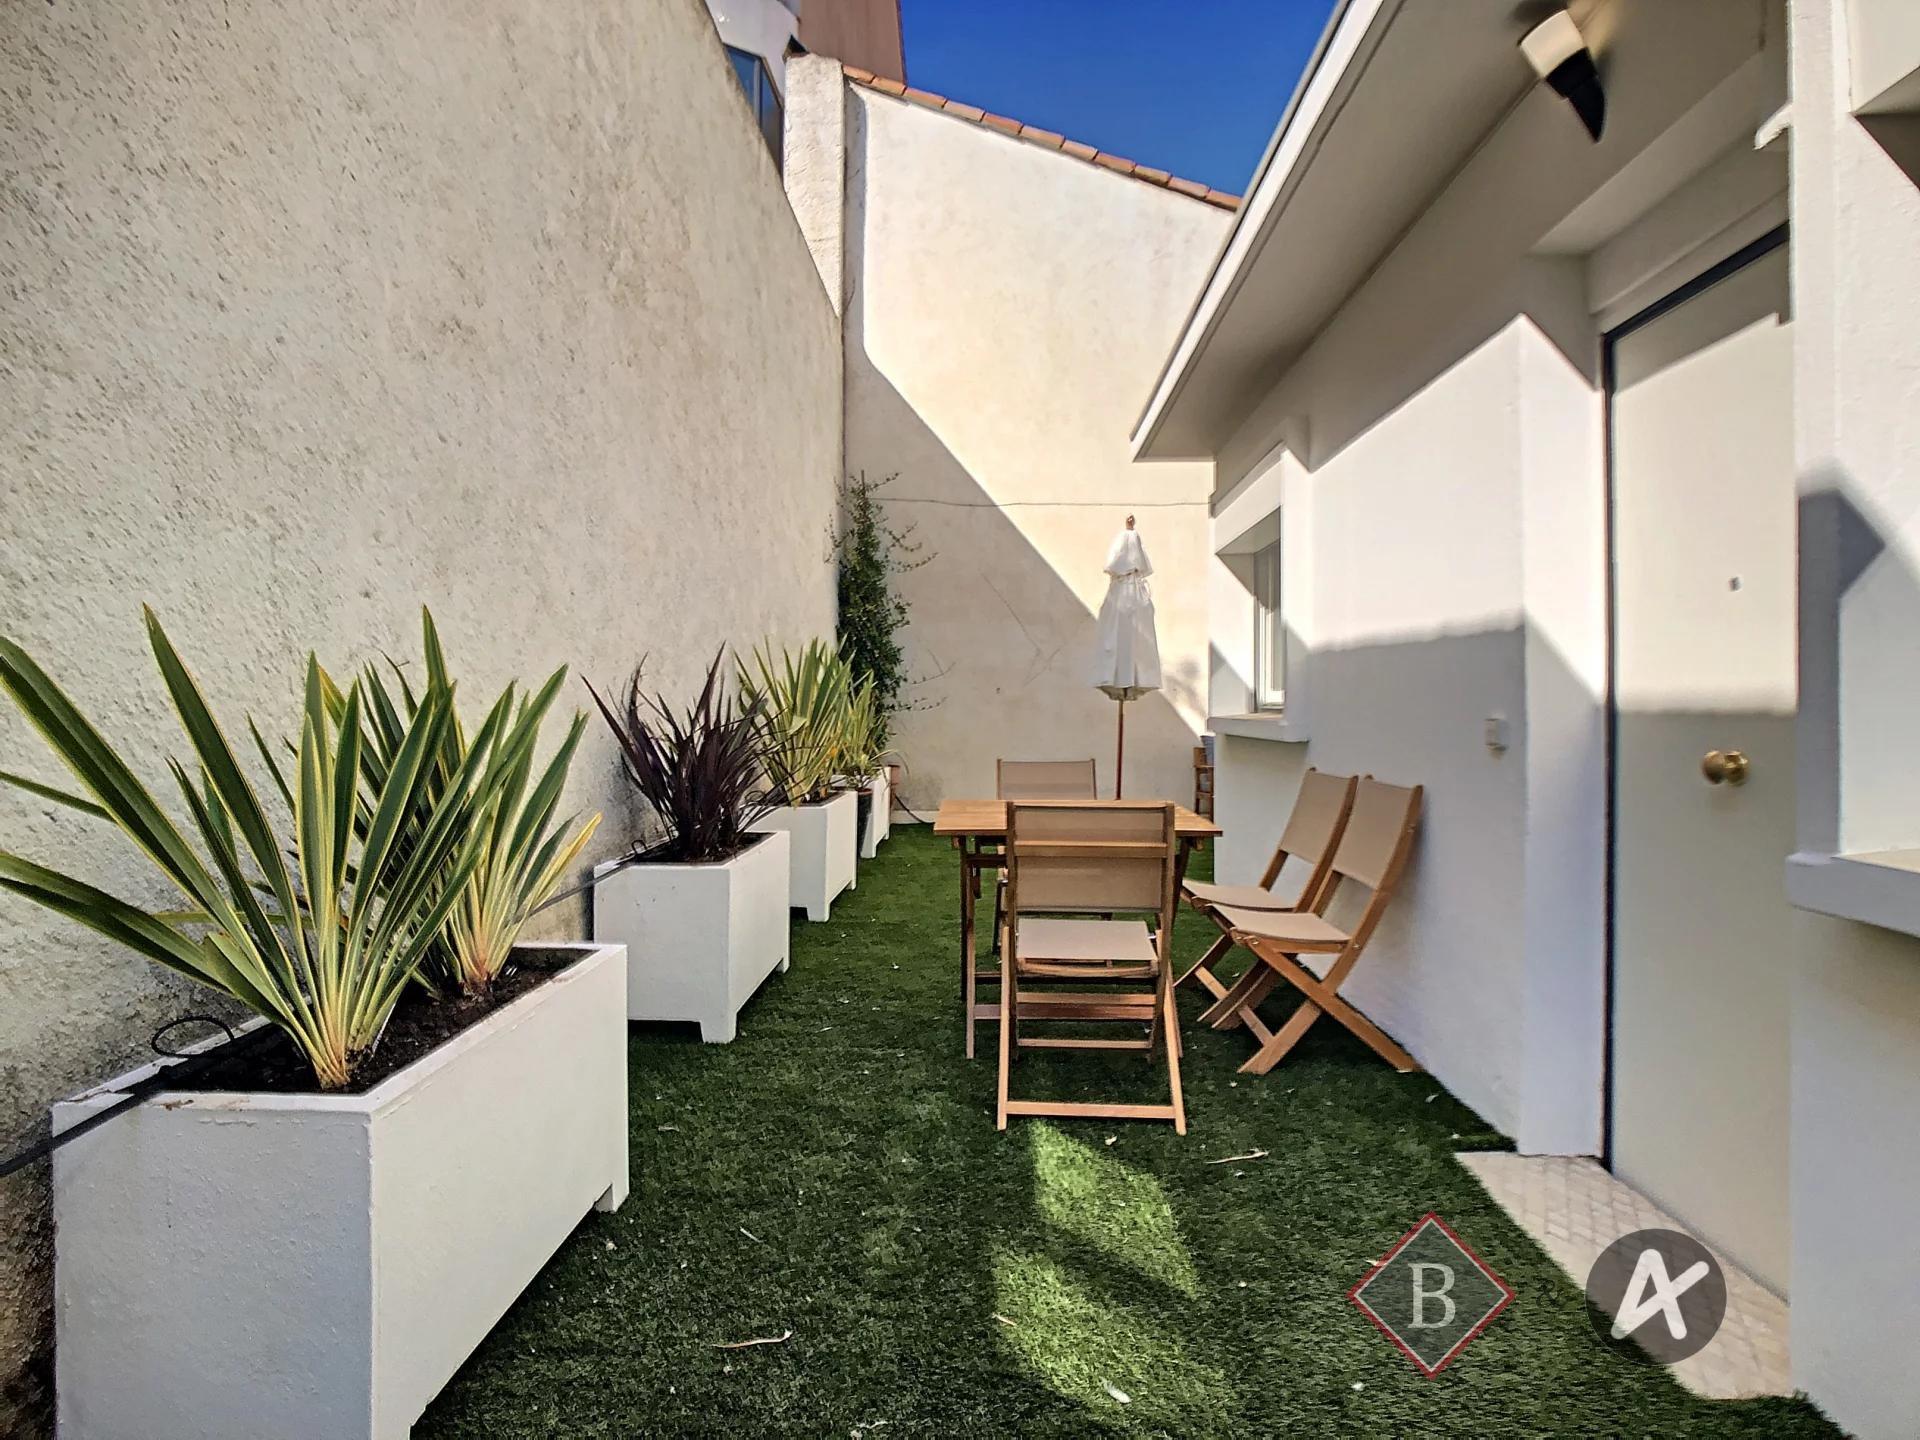 Cannes Banane - Studio avec terrasse